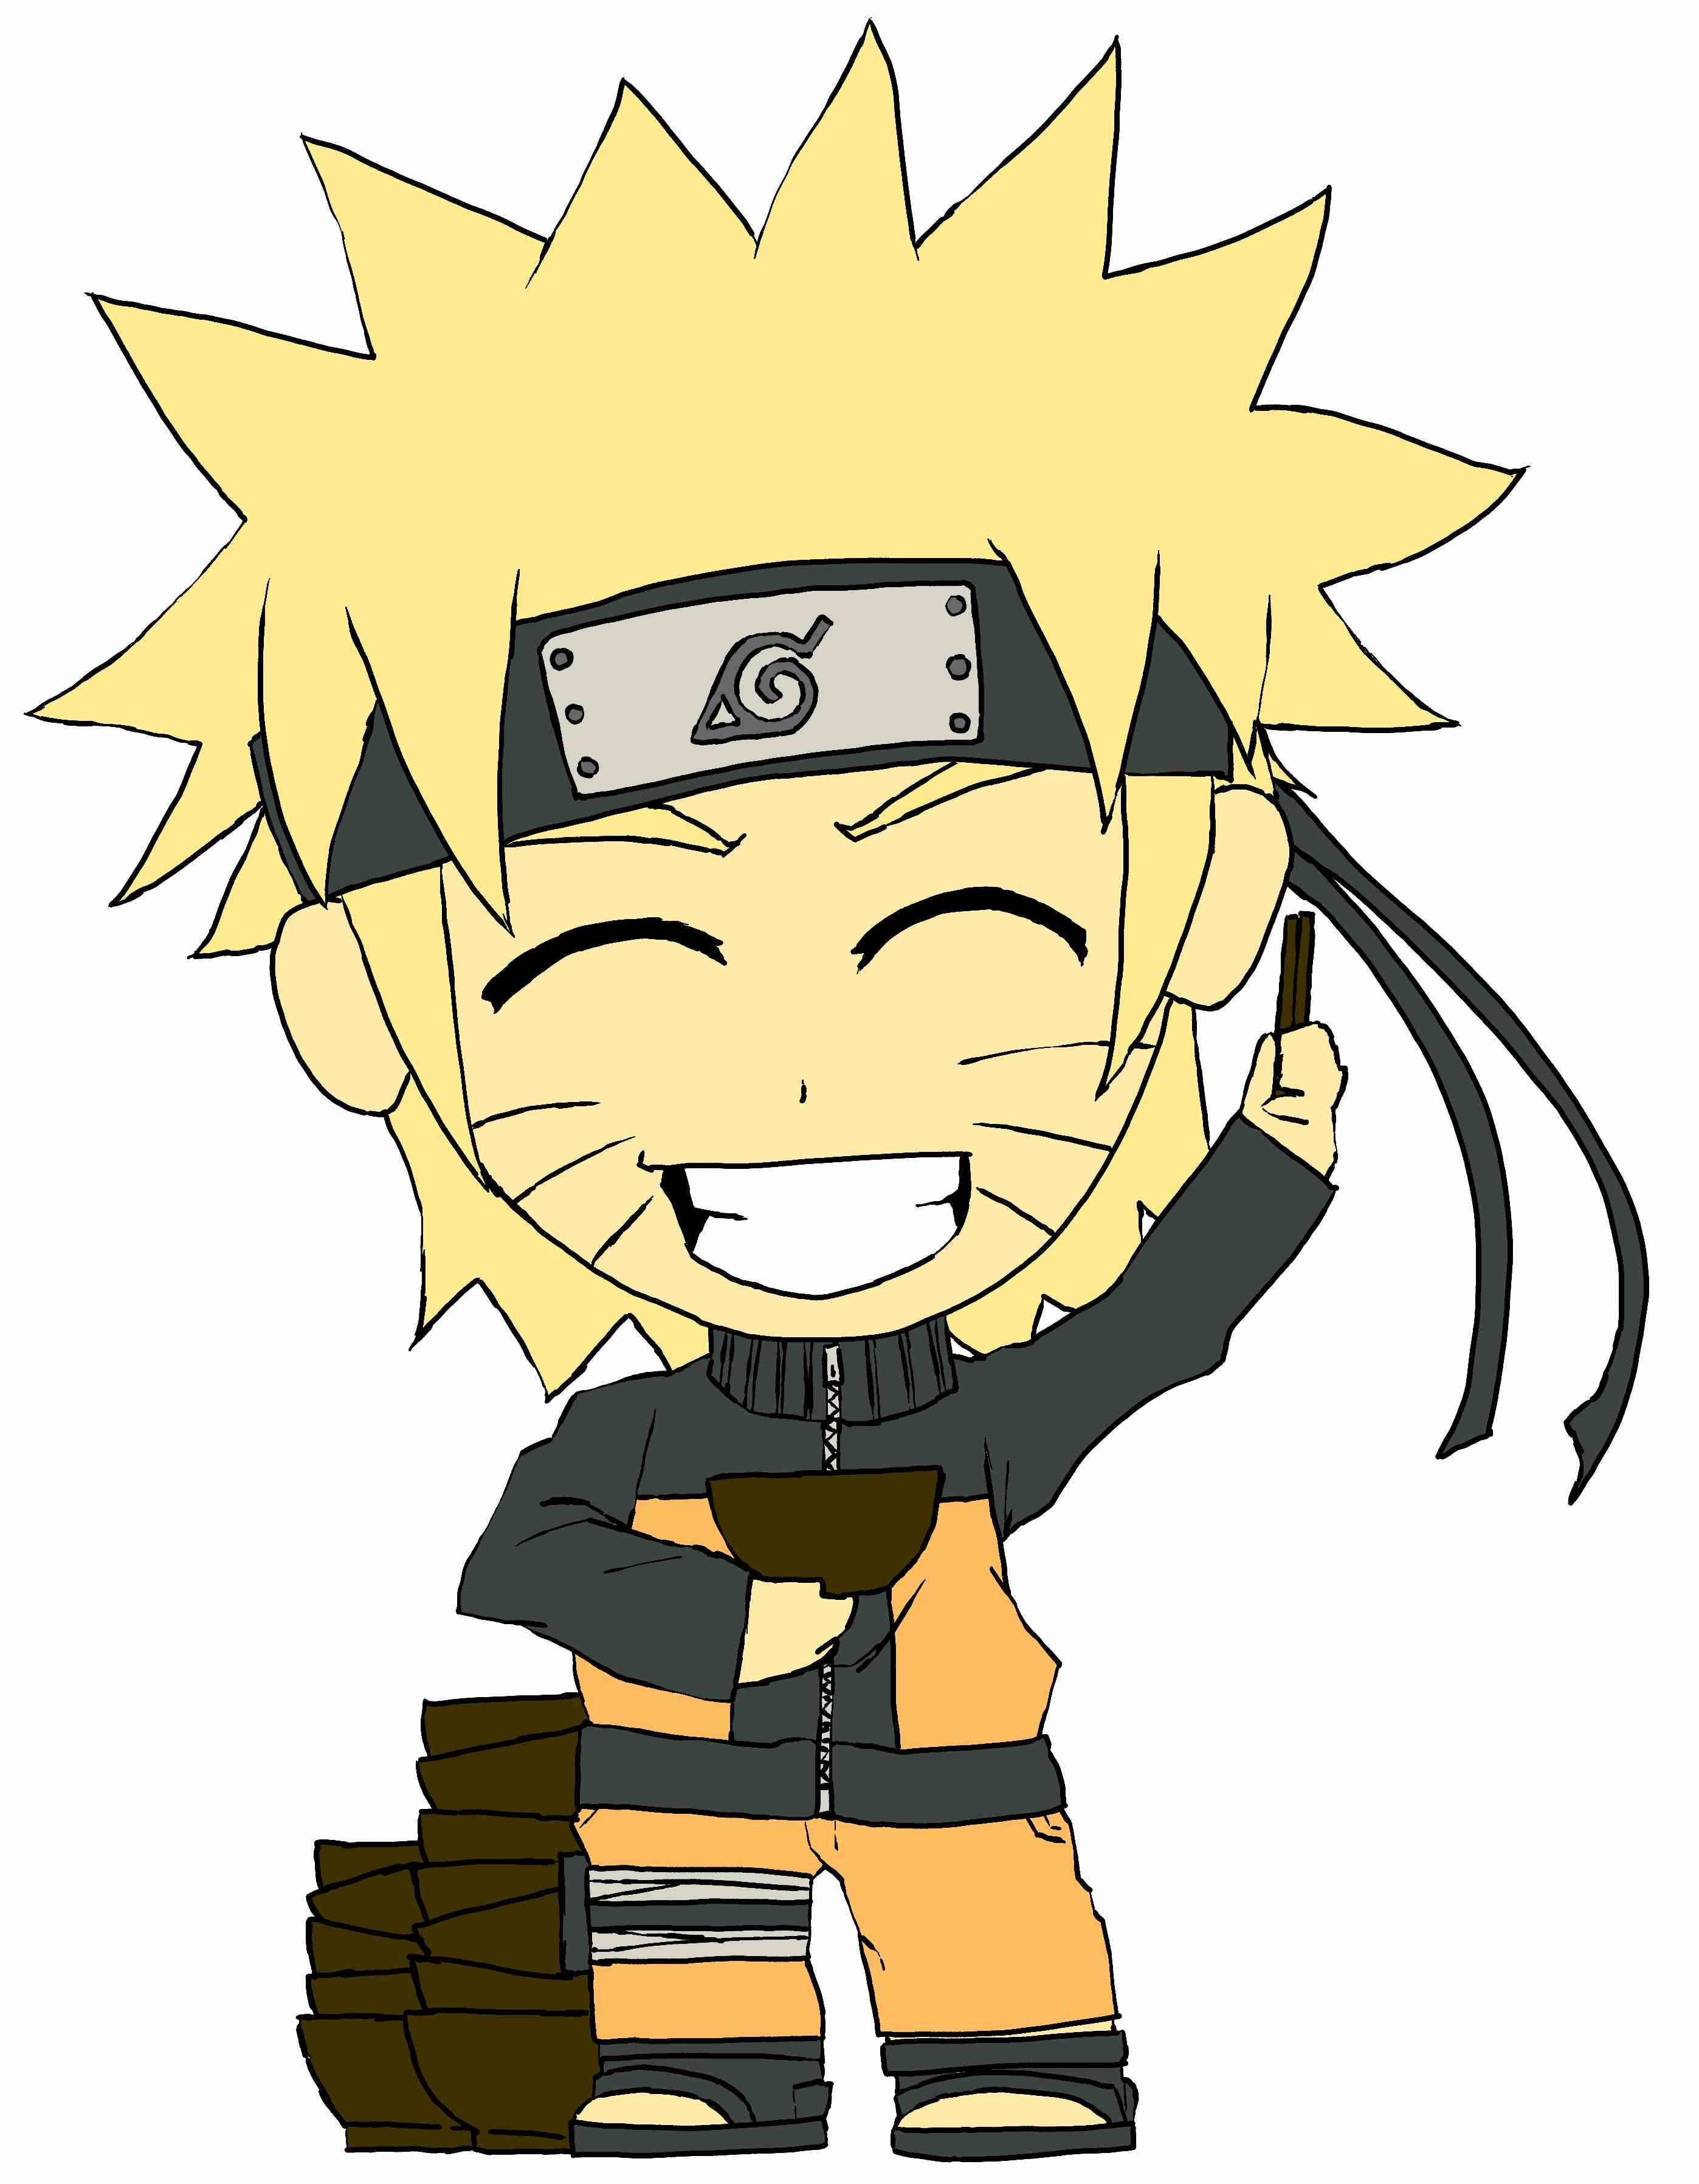 Chibi naruto uzumaki by animereviewguy on deviantart - Naruto chibi images ...